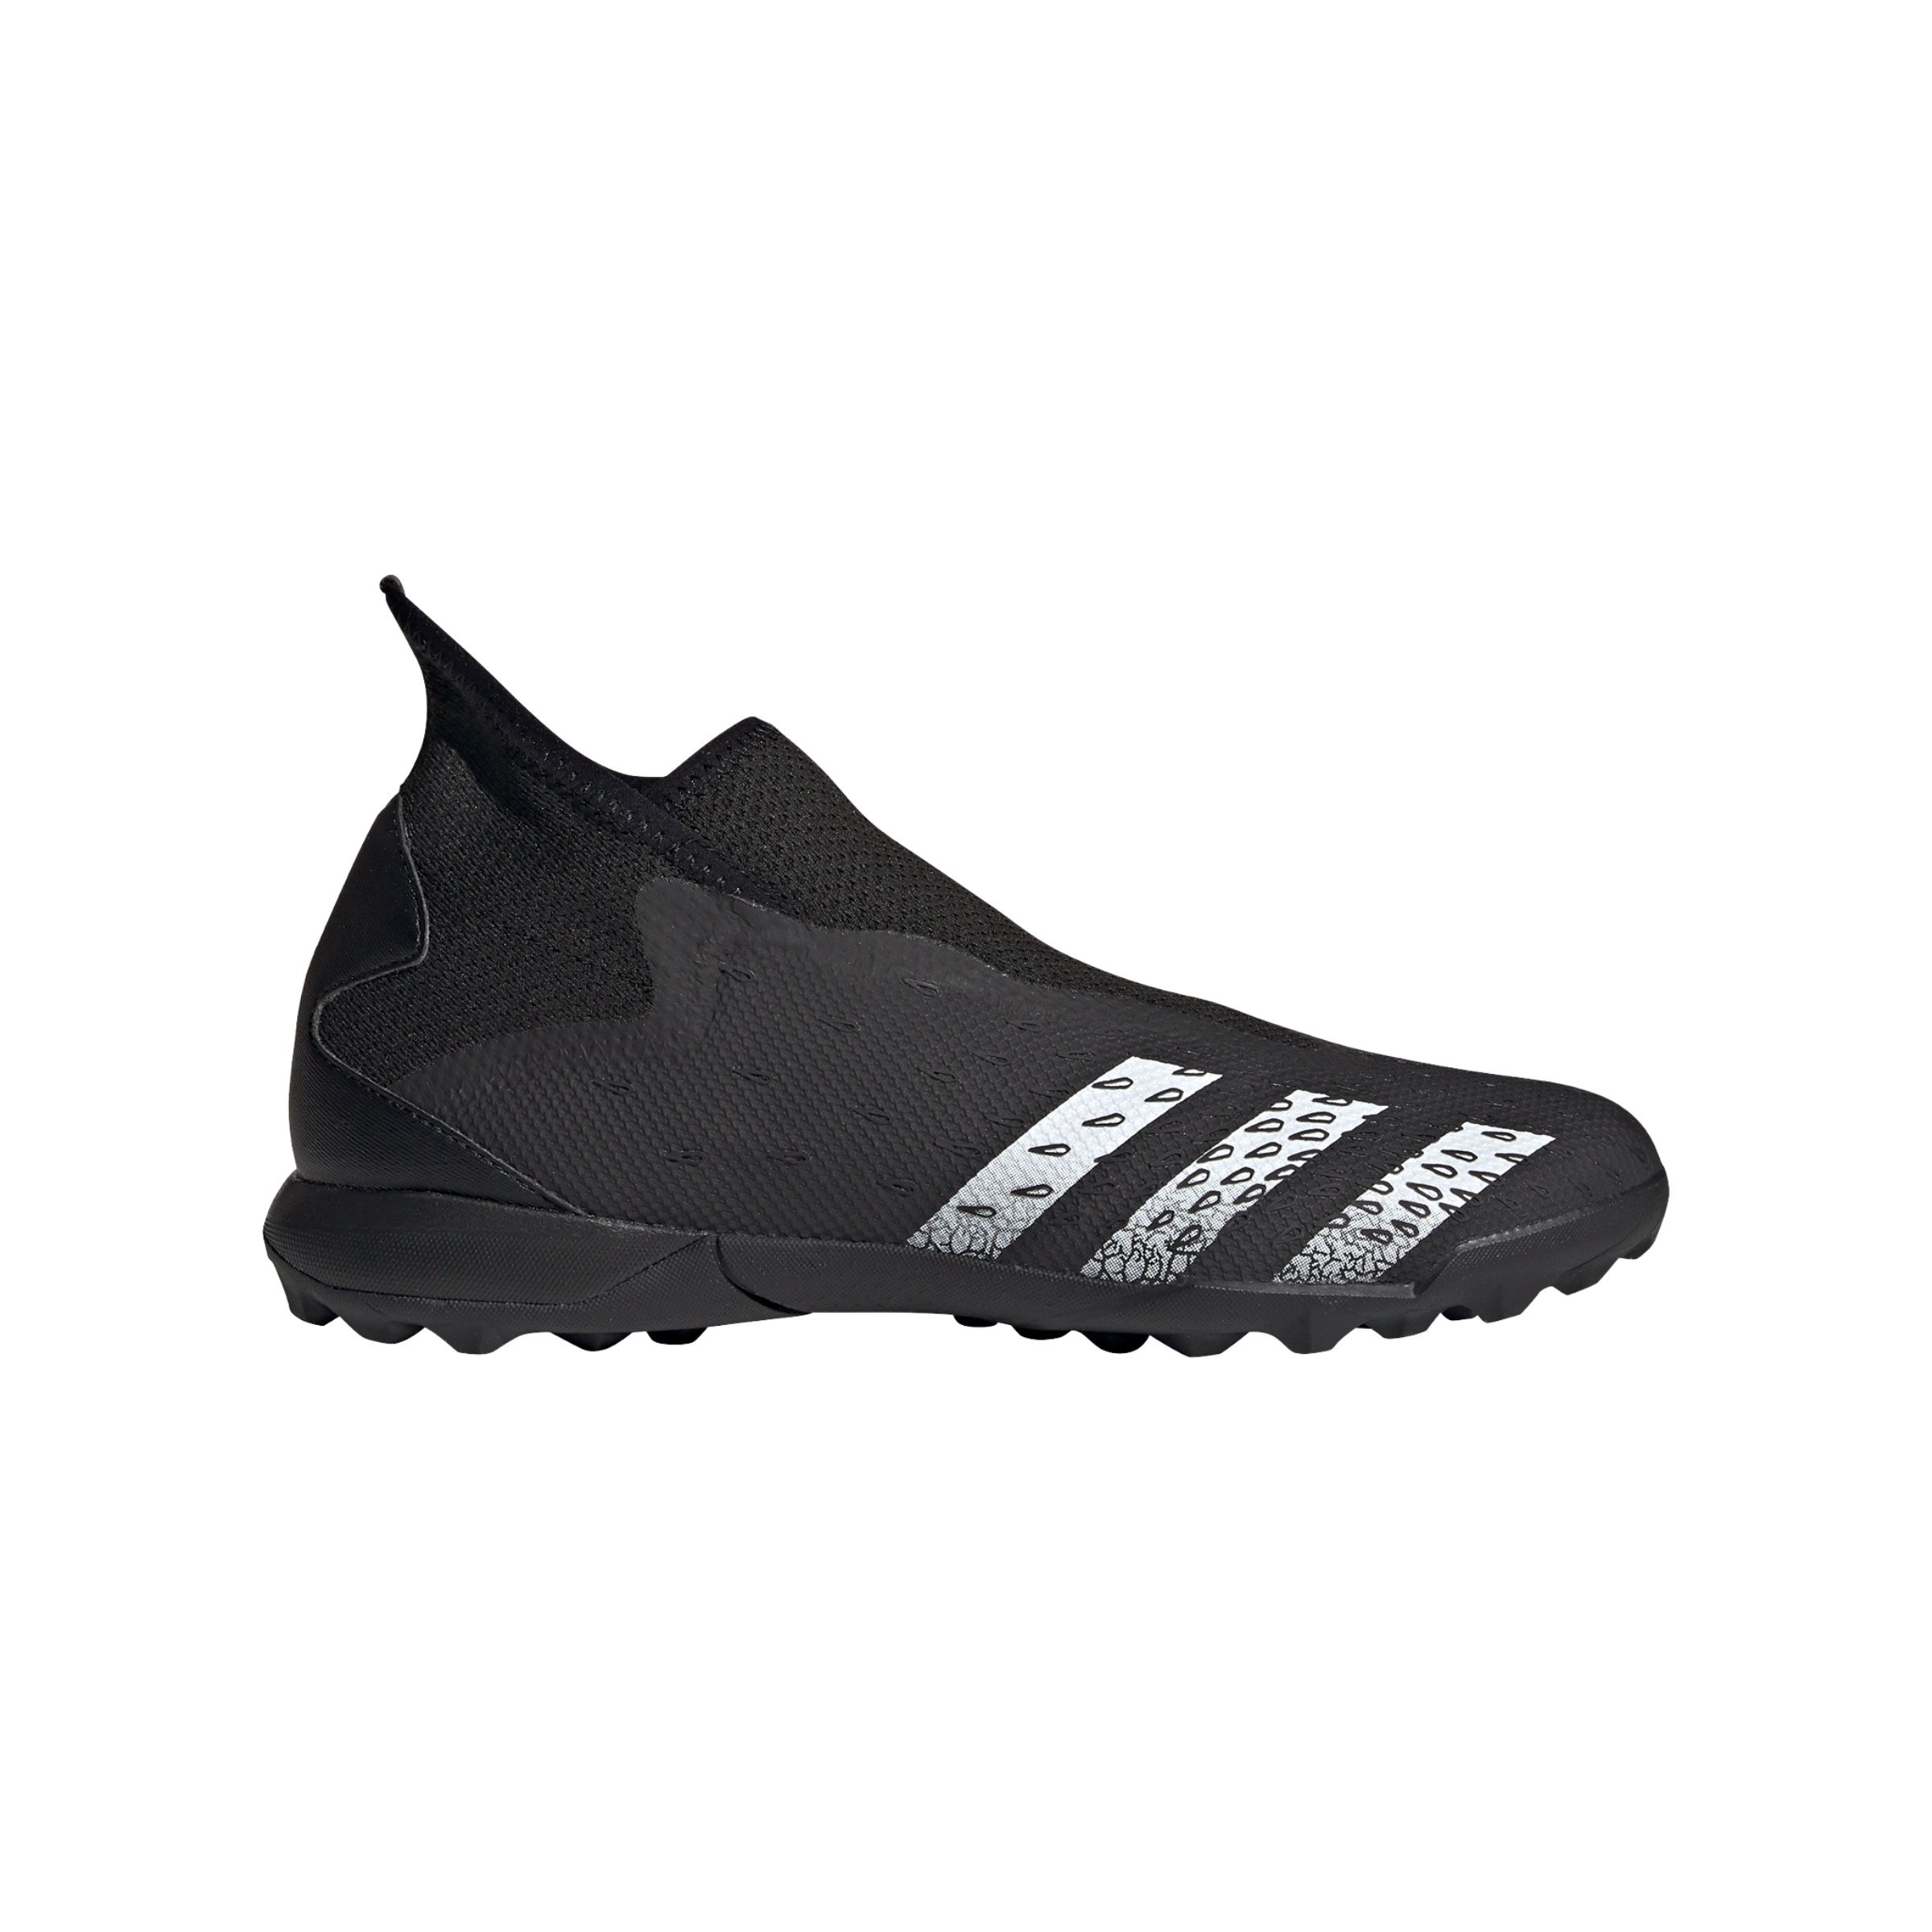 adidas Predator FREAK.3 LL TF Schwarz Weiss - schwarz